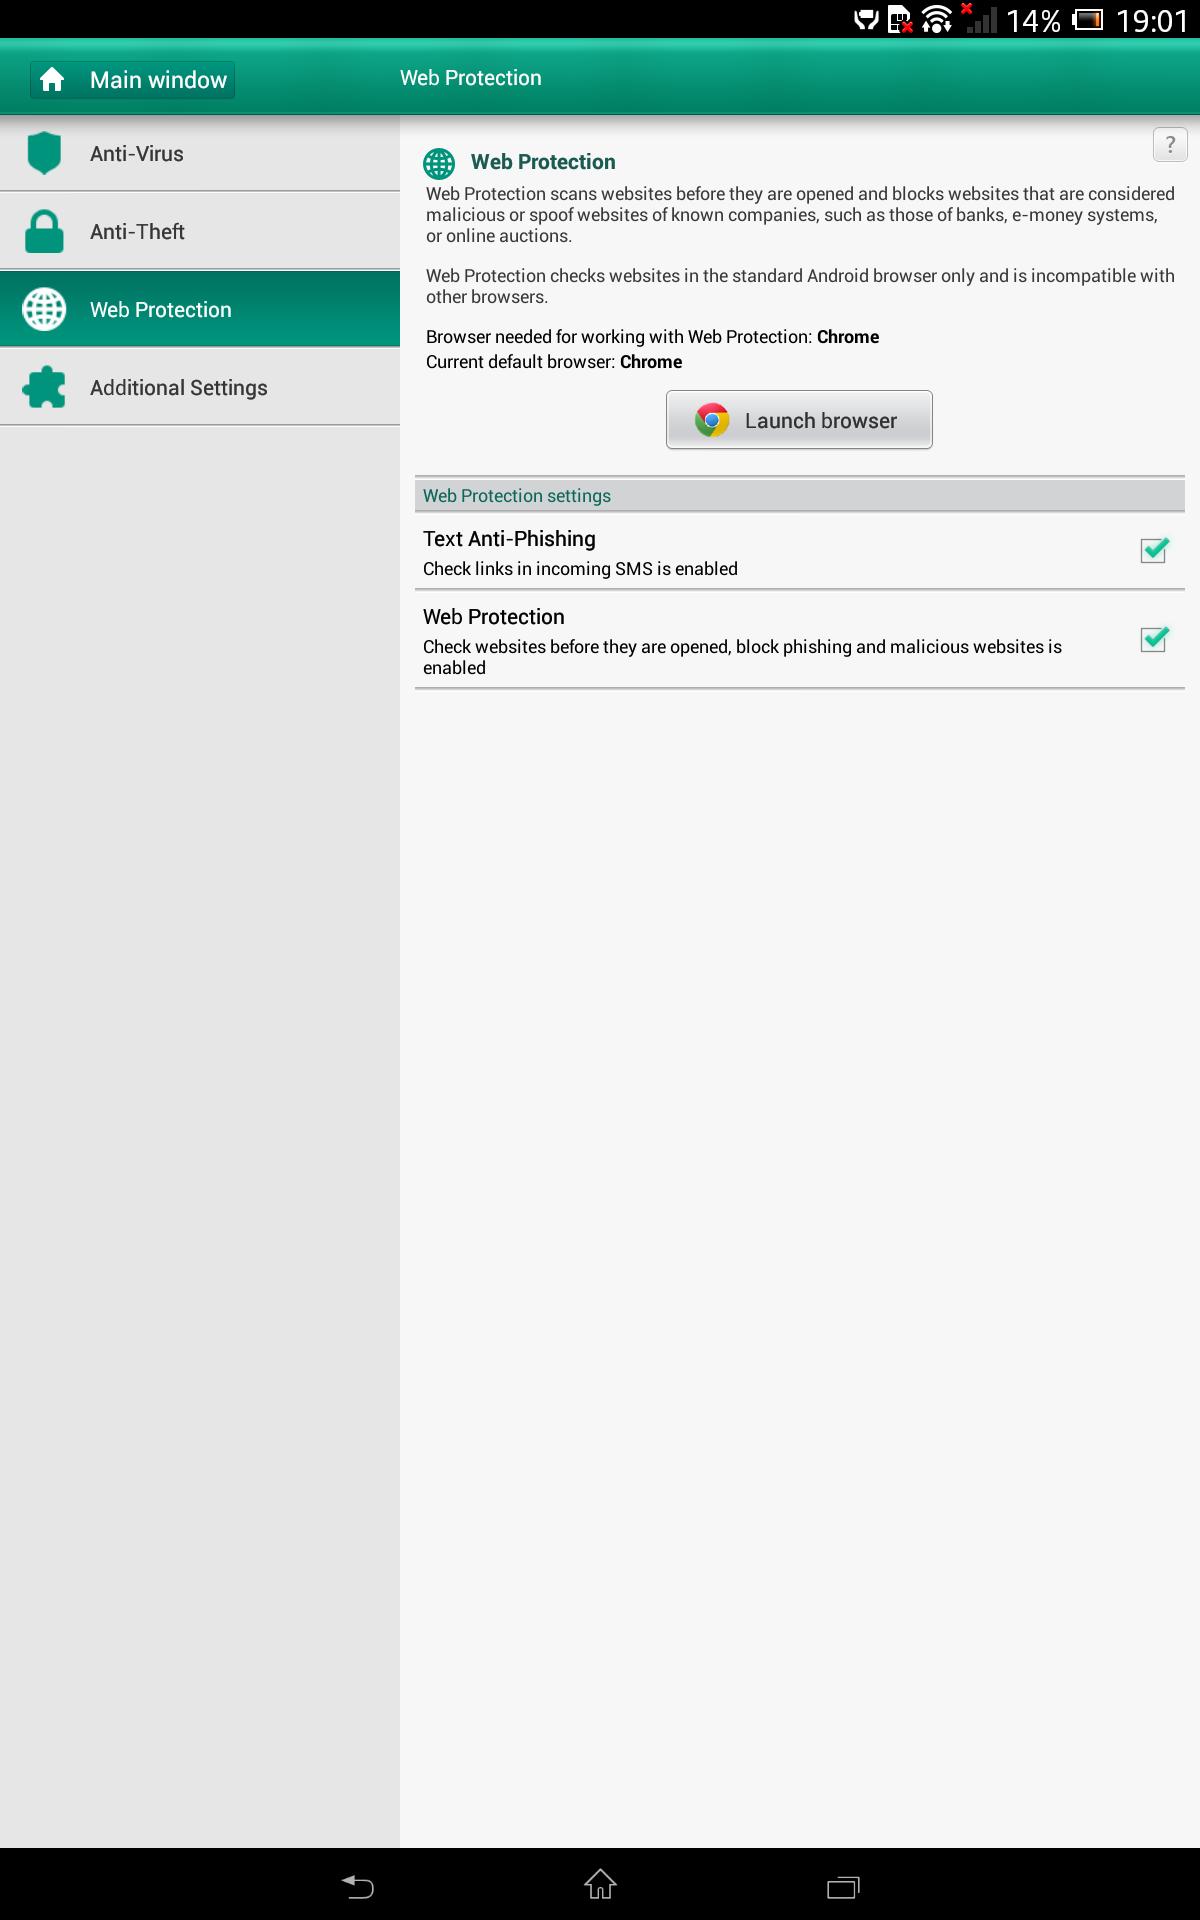 Sony Xpera Z tablet Screenshot 5